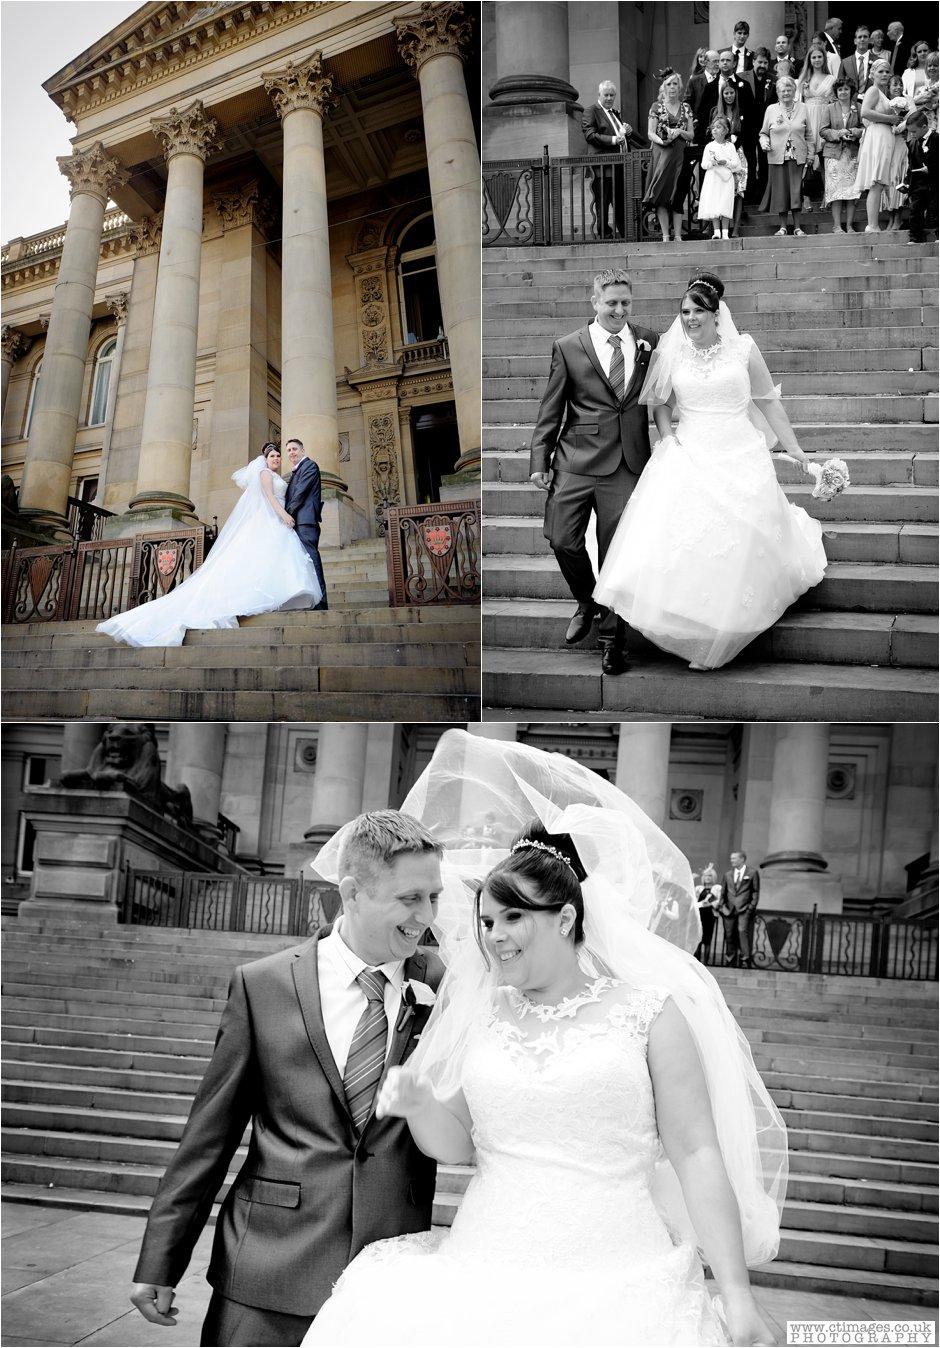 bolton-albert-halls-wedding-photographer-pack-horse-affetside-weddings-female-photography-creative-photographers_0018.jpg